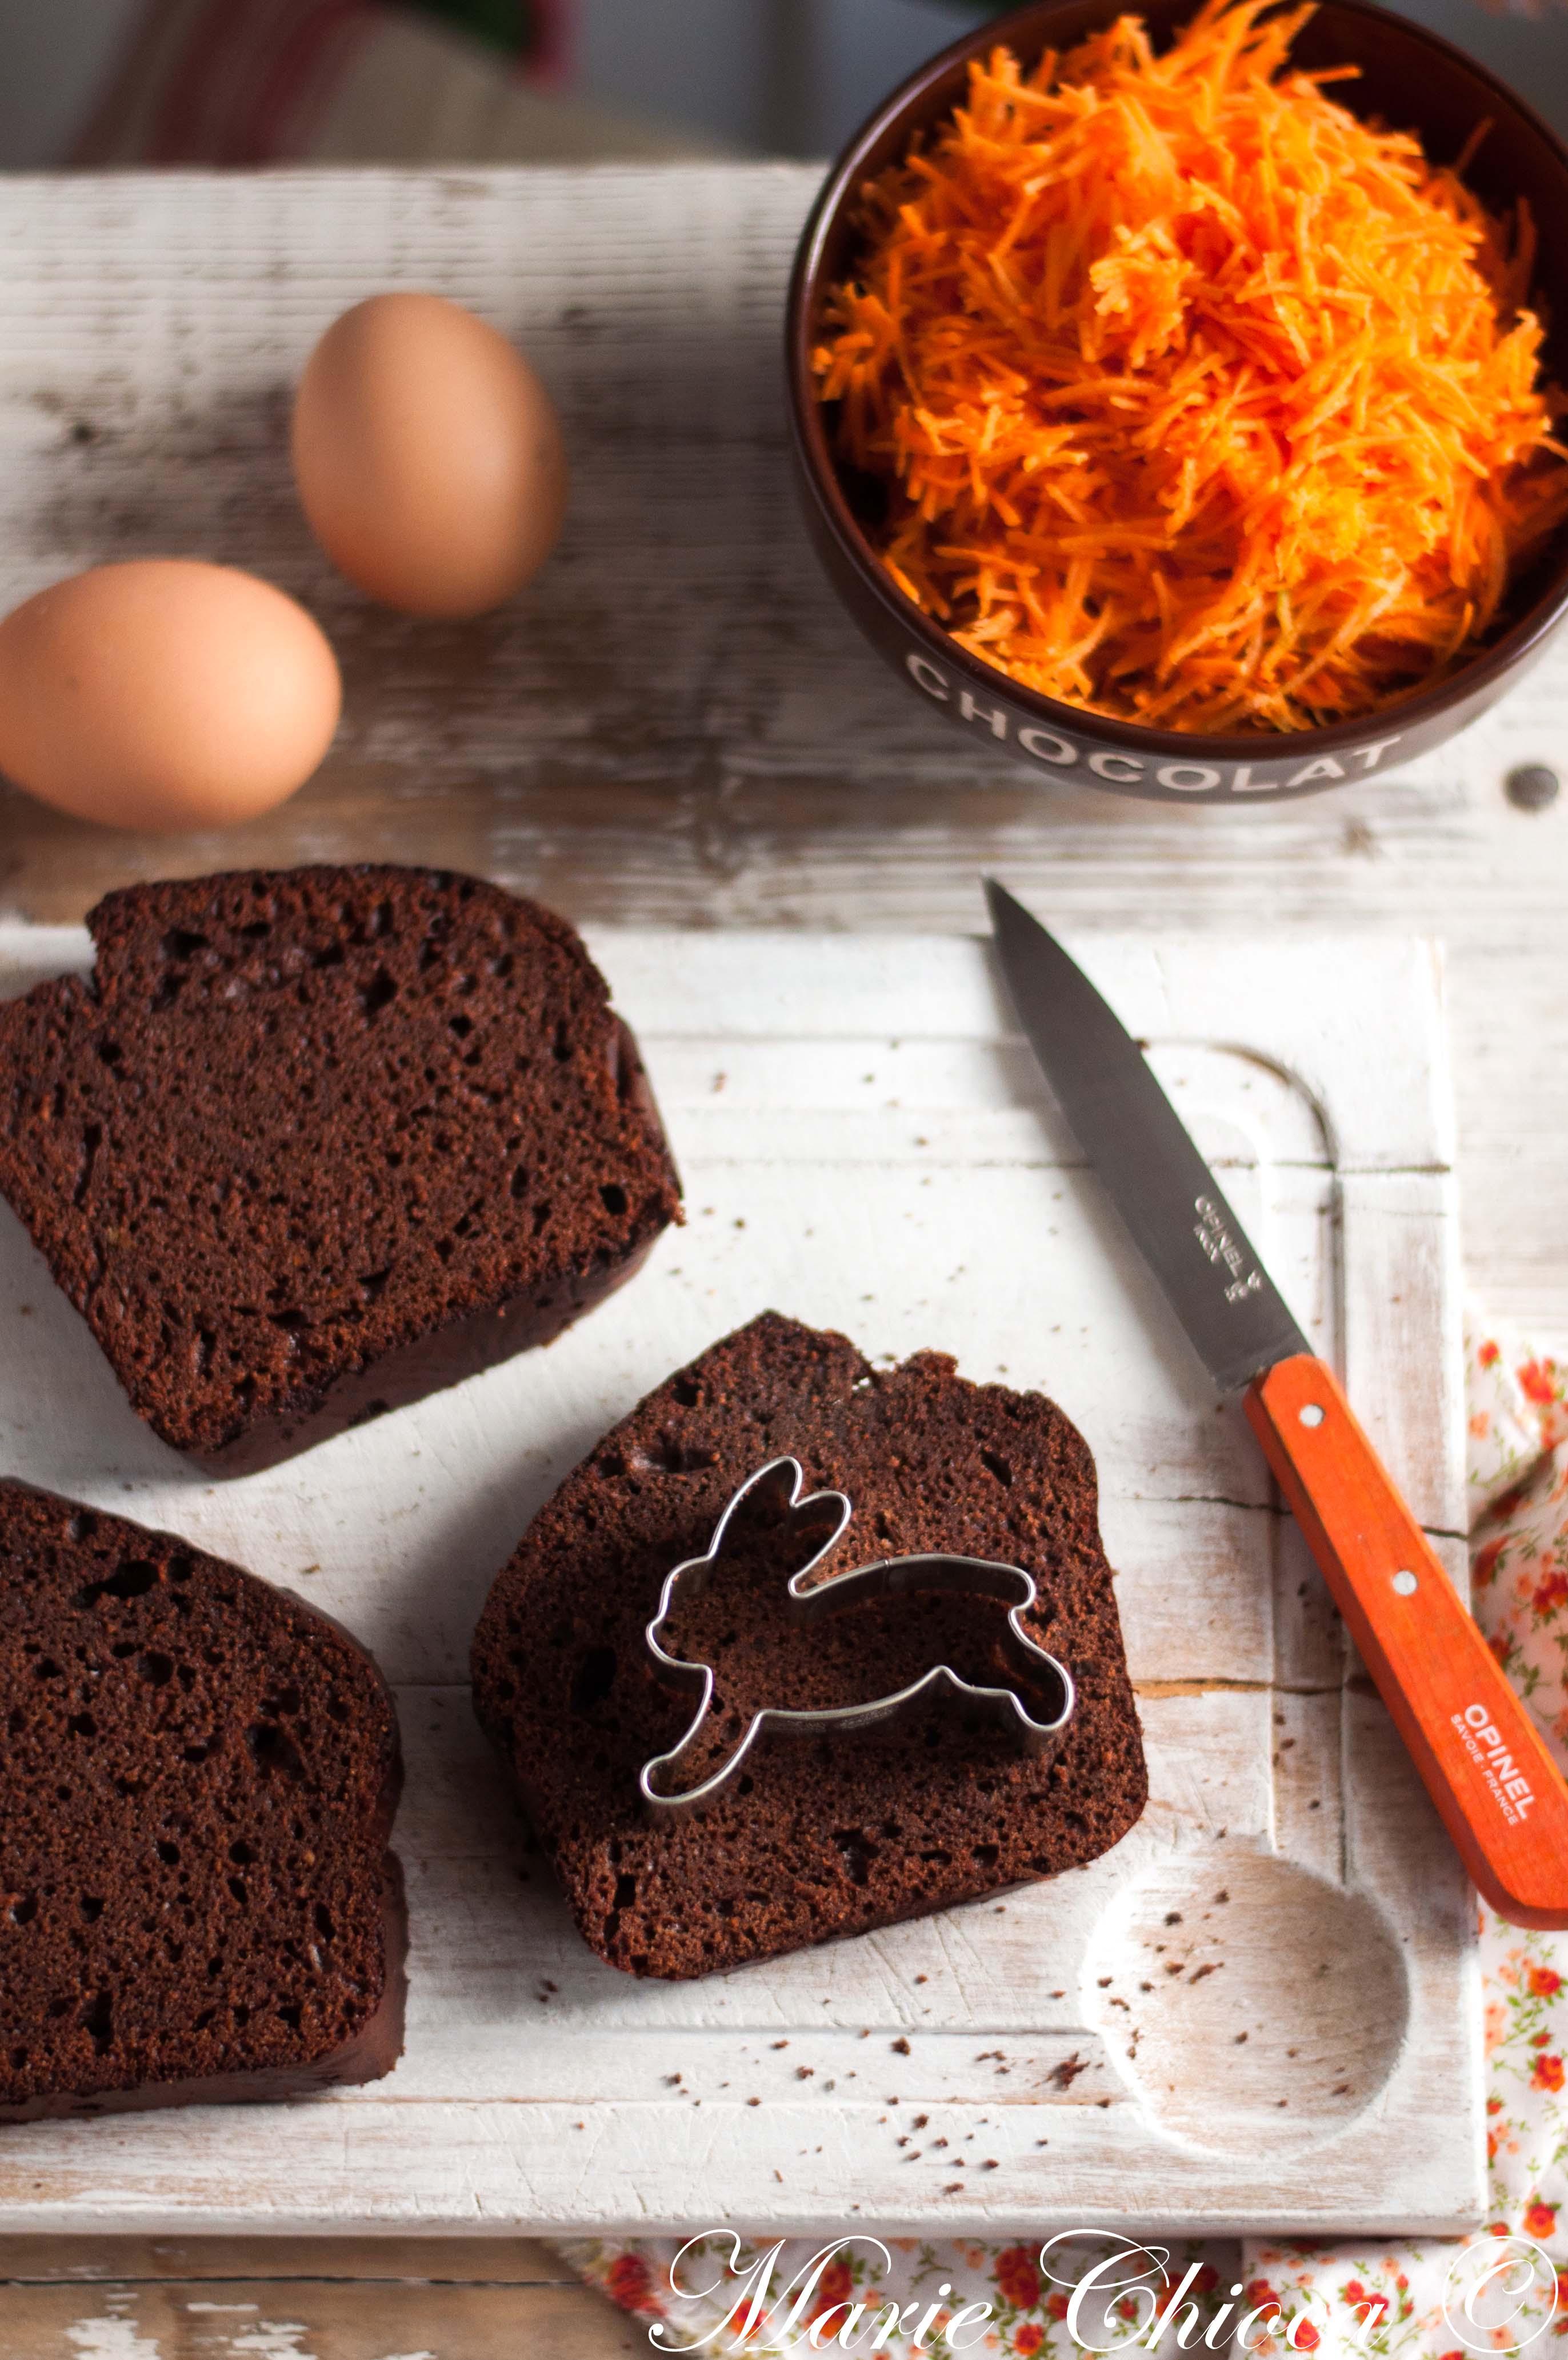 Carrot-cake surprise 4